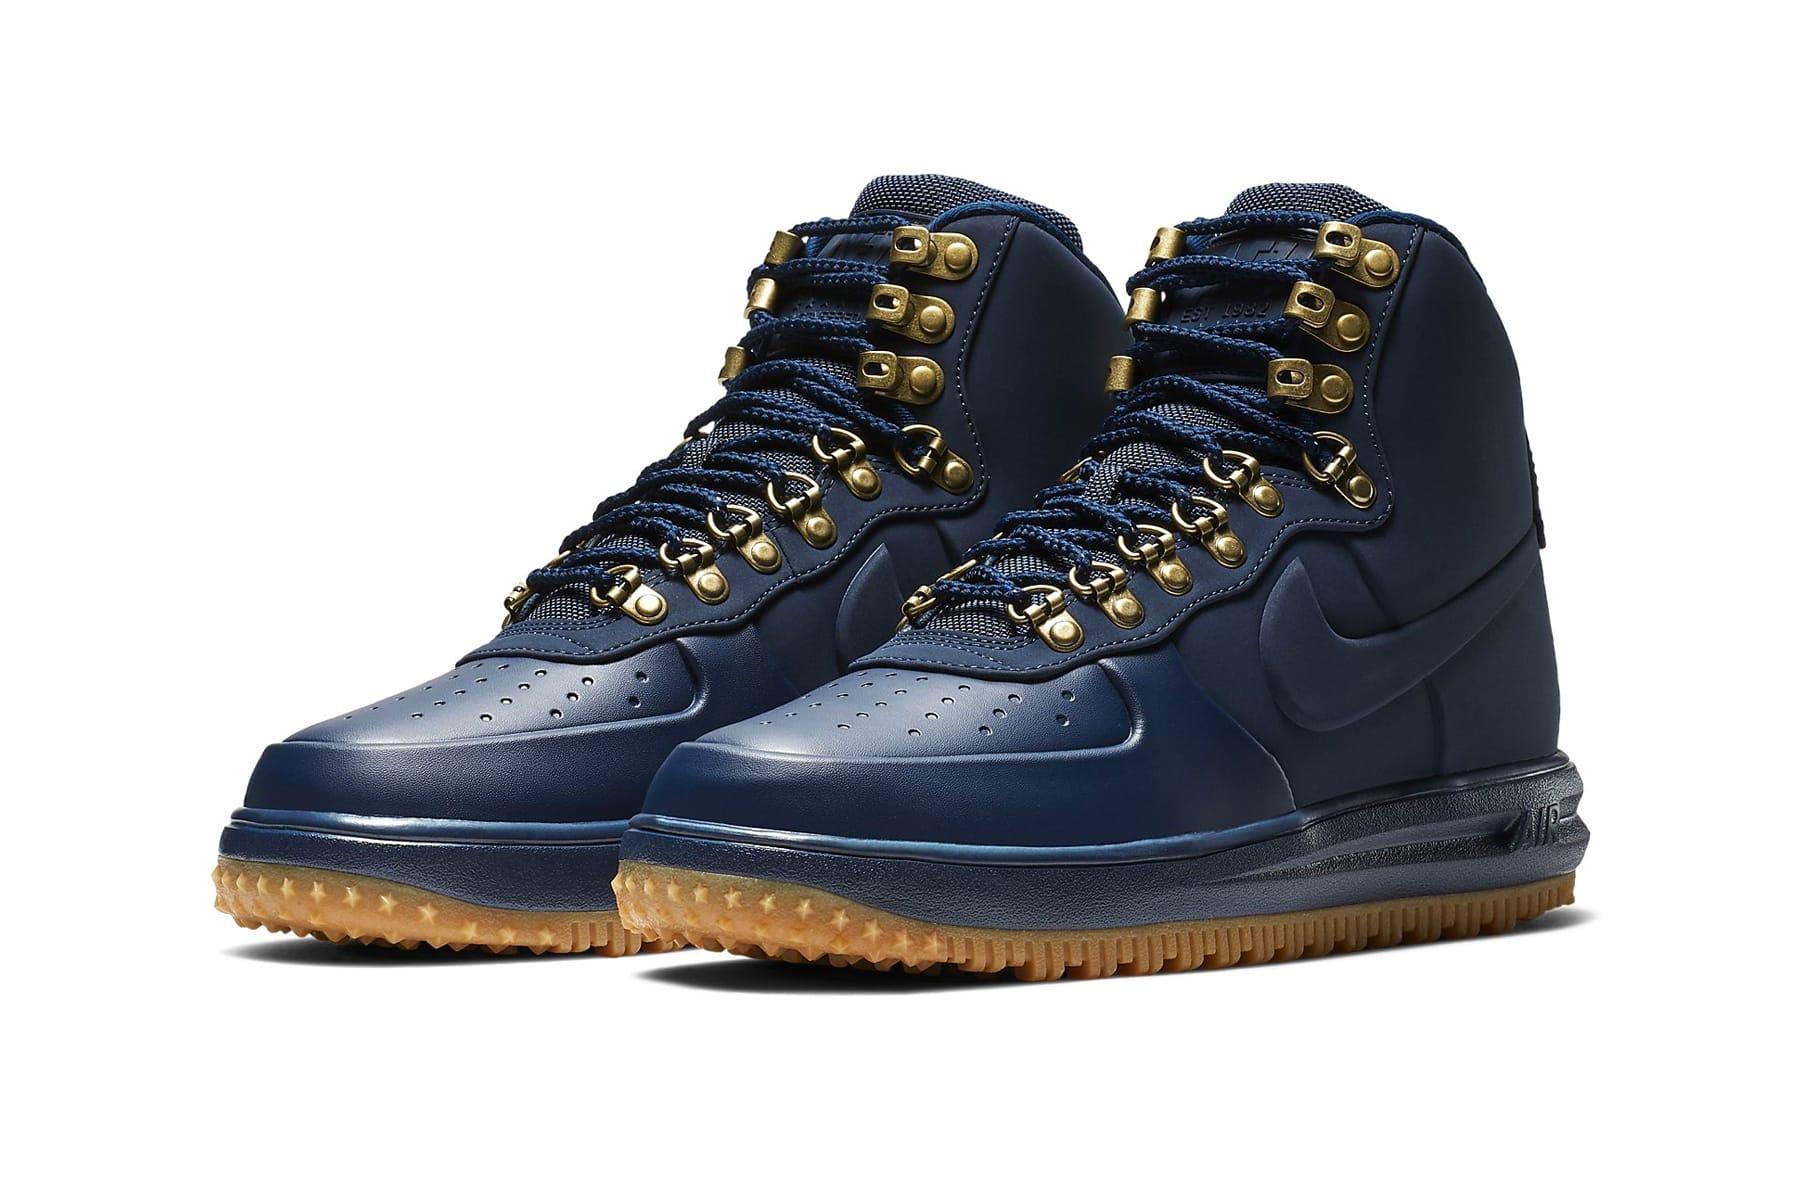 nike air force 1 duckboot release date